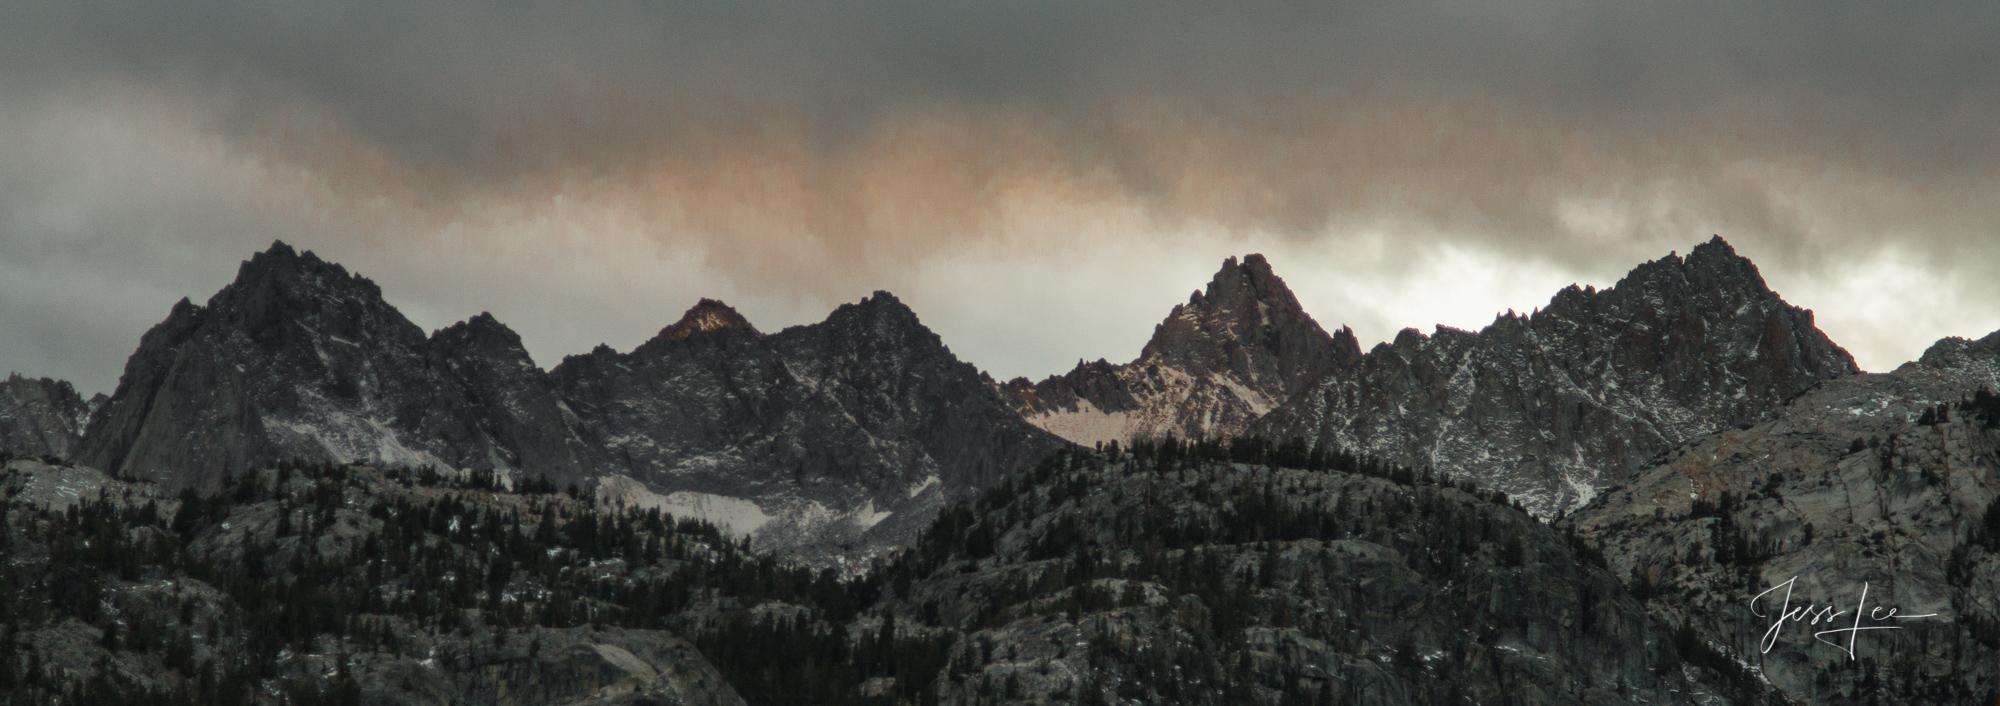 yosemite, mountains, desert, death valley, ocean,, photo